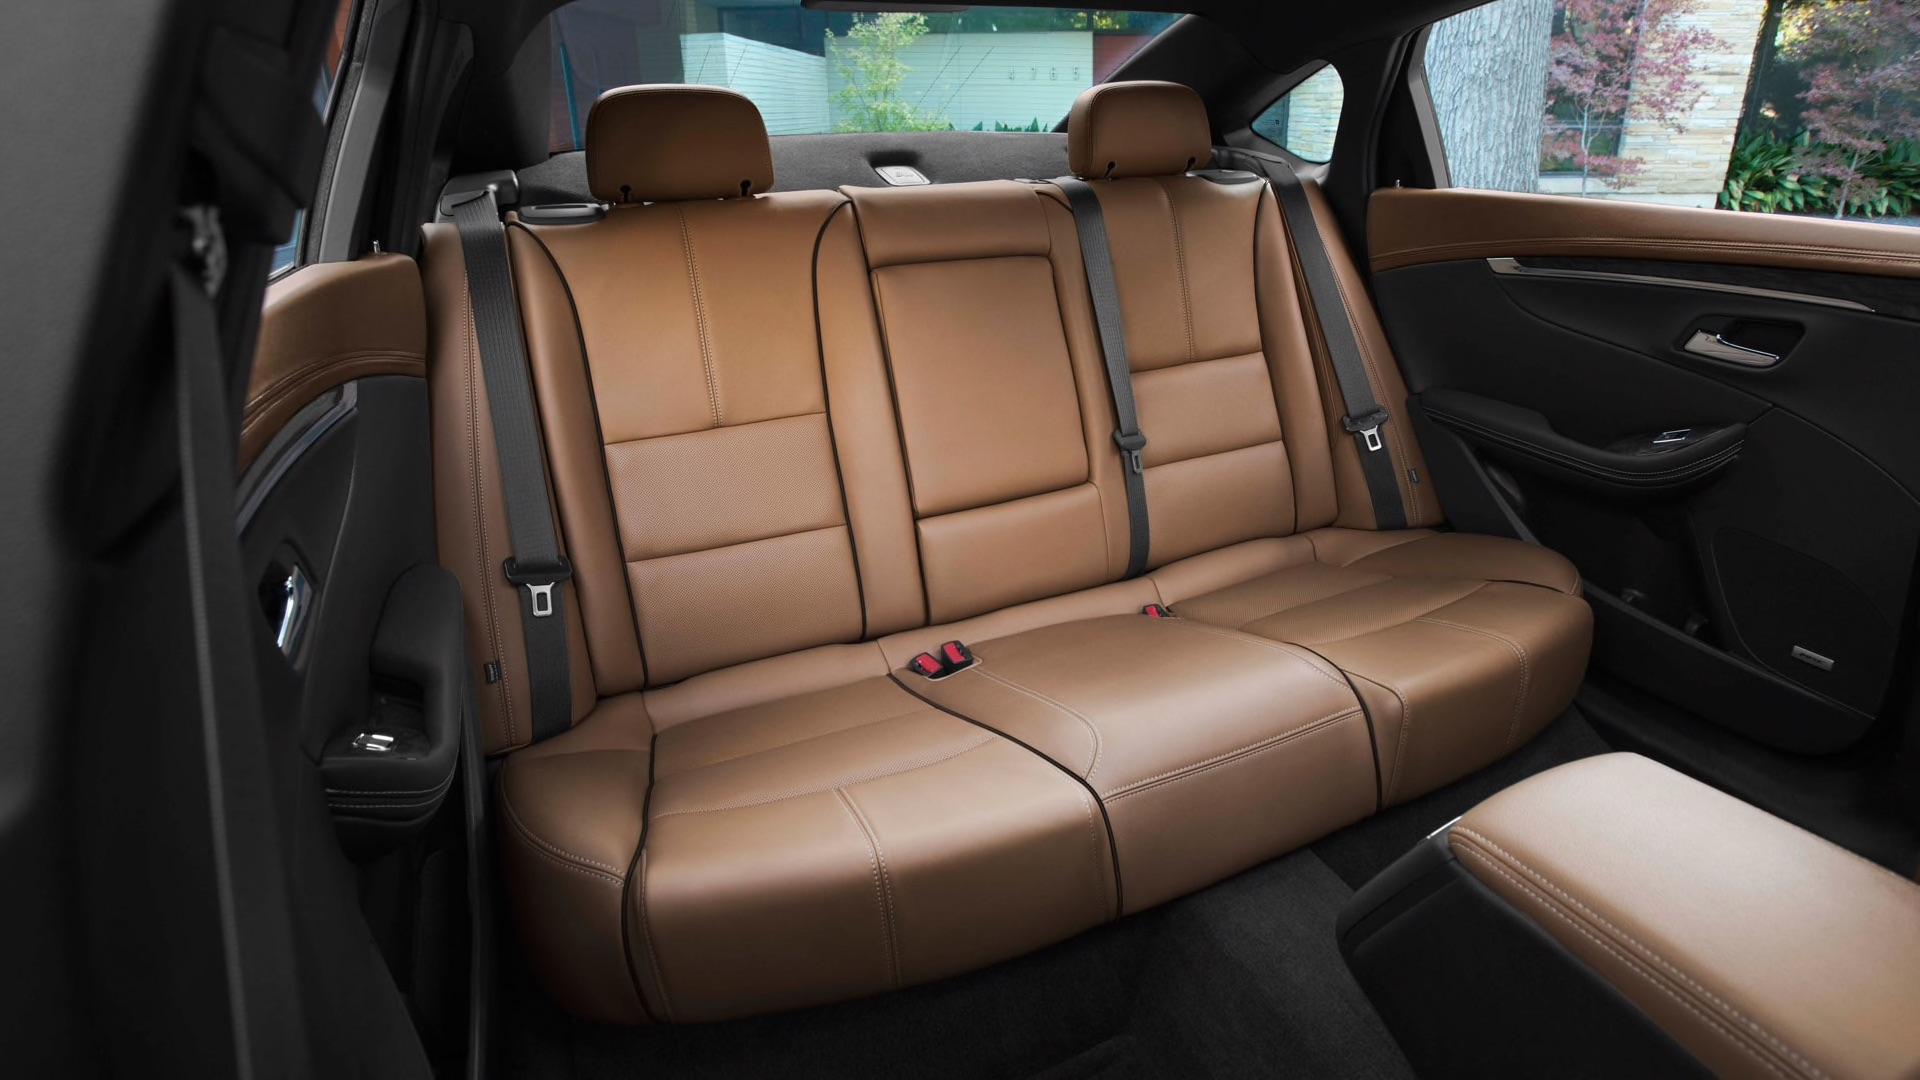 2016 Chevy Impala Upholstery